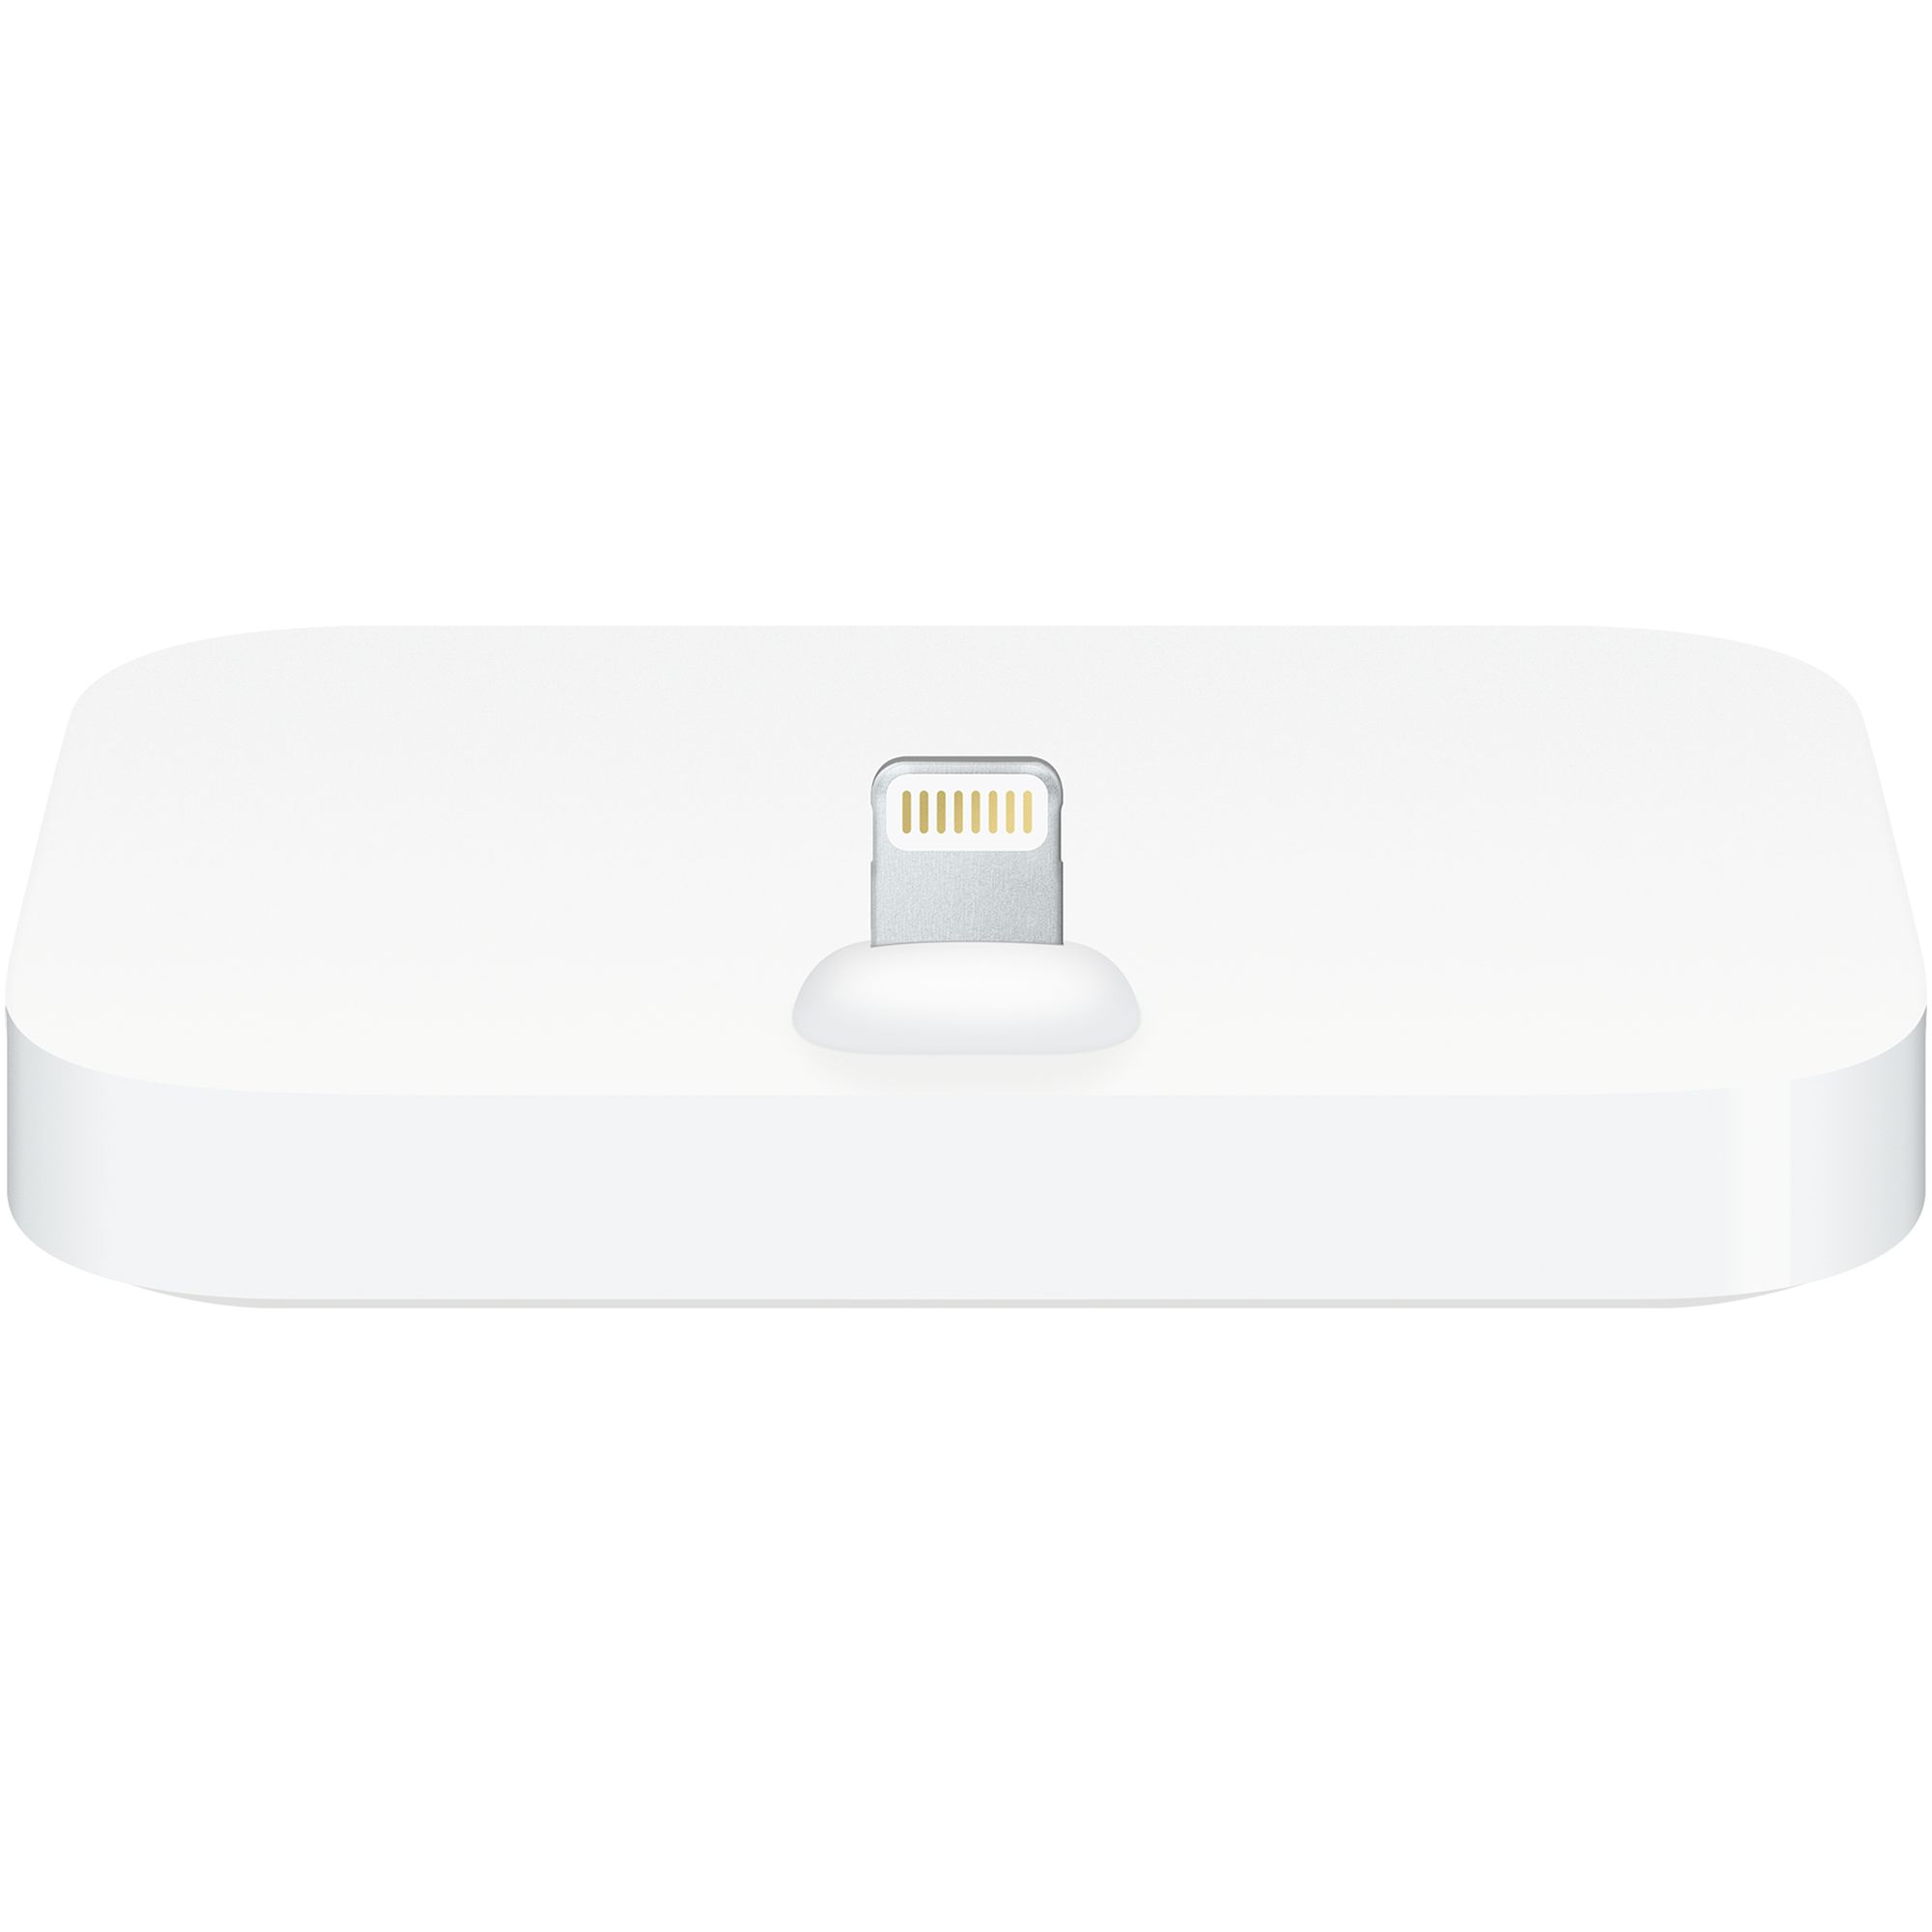 Dokovací stanice pro iPhone - Apple, iPhone Lightning Dock White